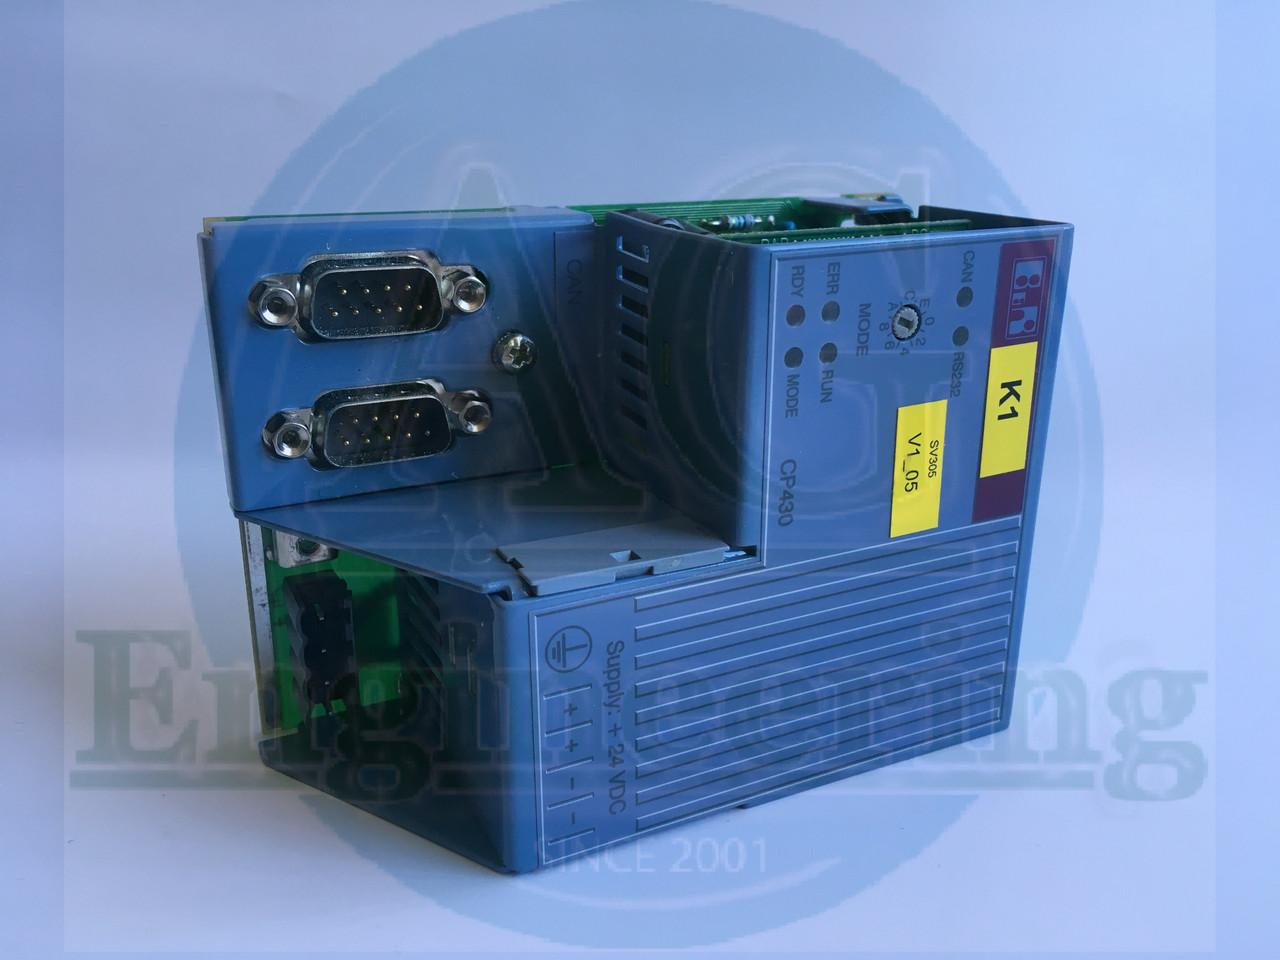 CPU для SV-305 (B&R) rev. GO, 376335